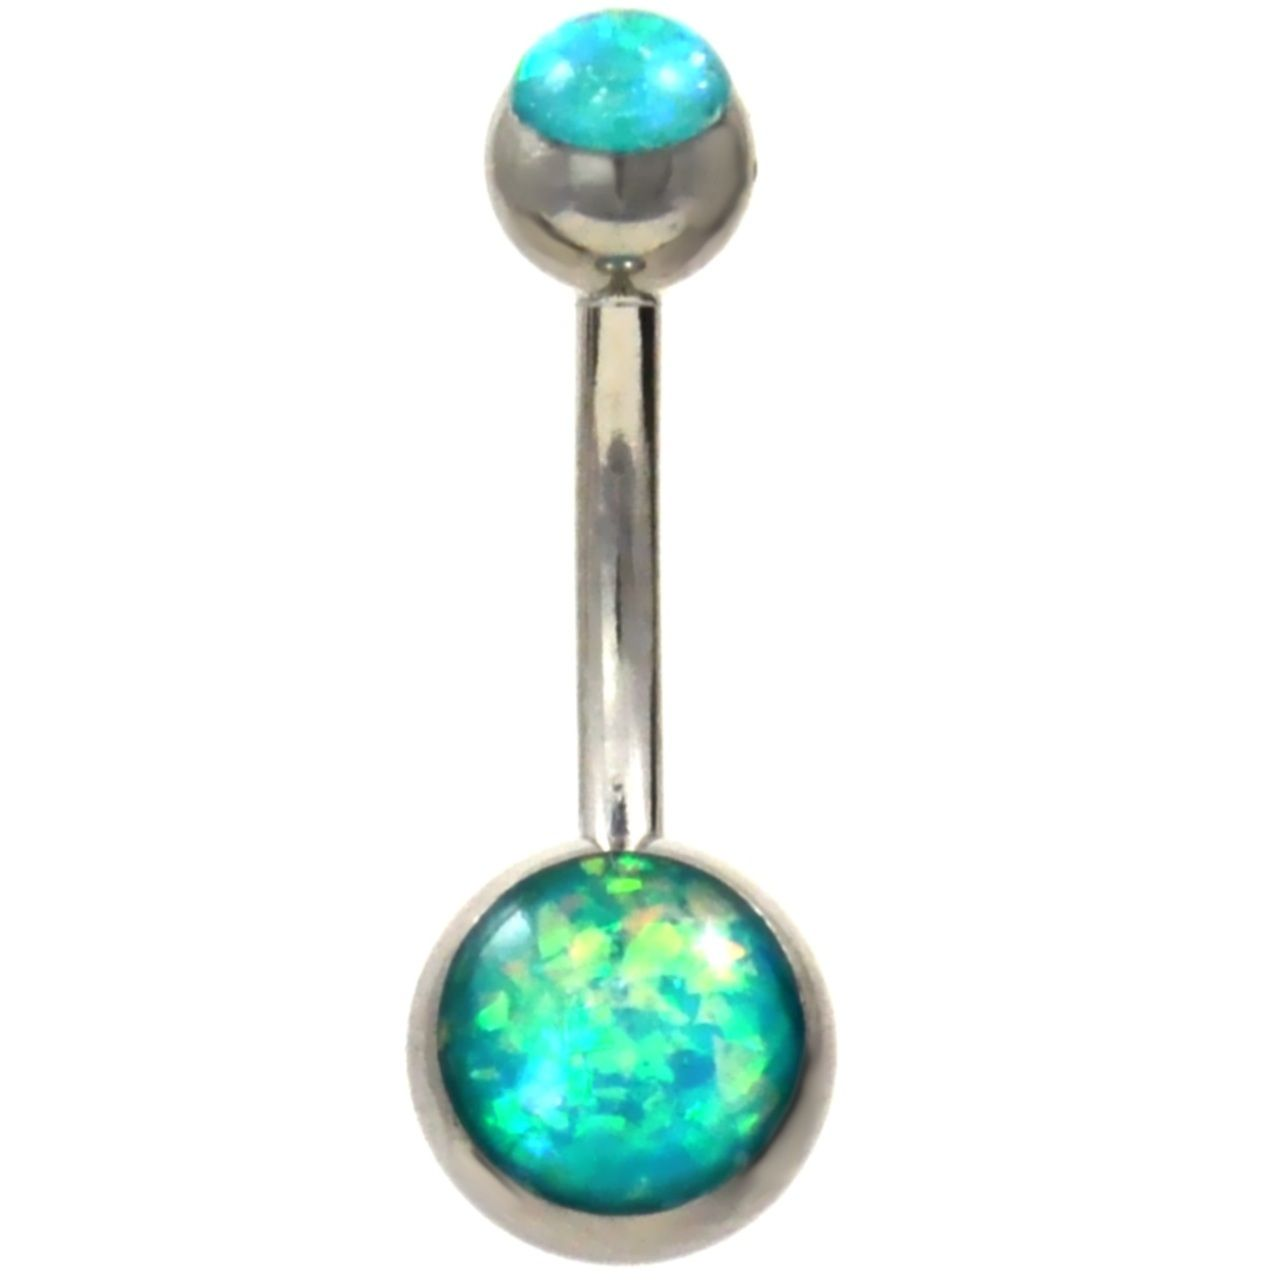 Glitter Opal Gold Belly Bars Navel Button Bar Body Piercing Jewellery